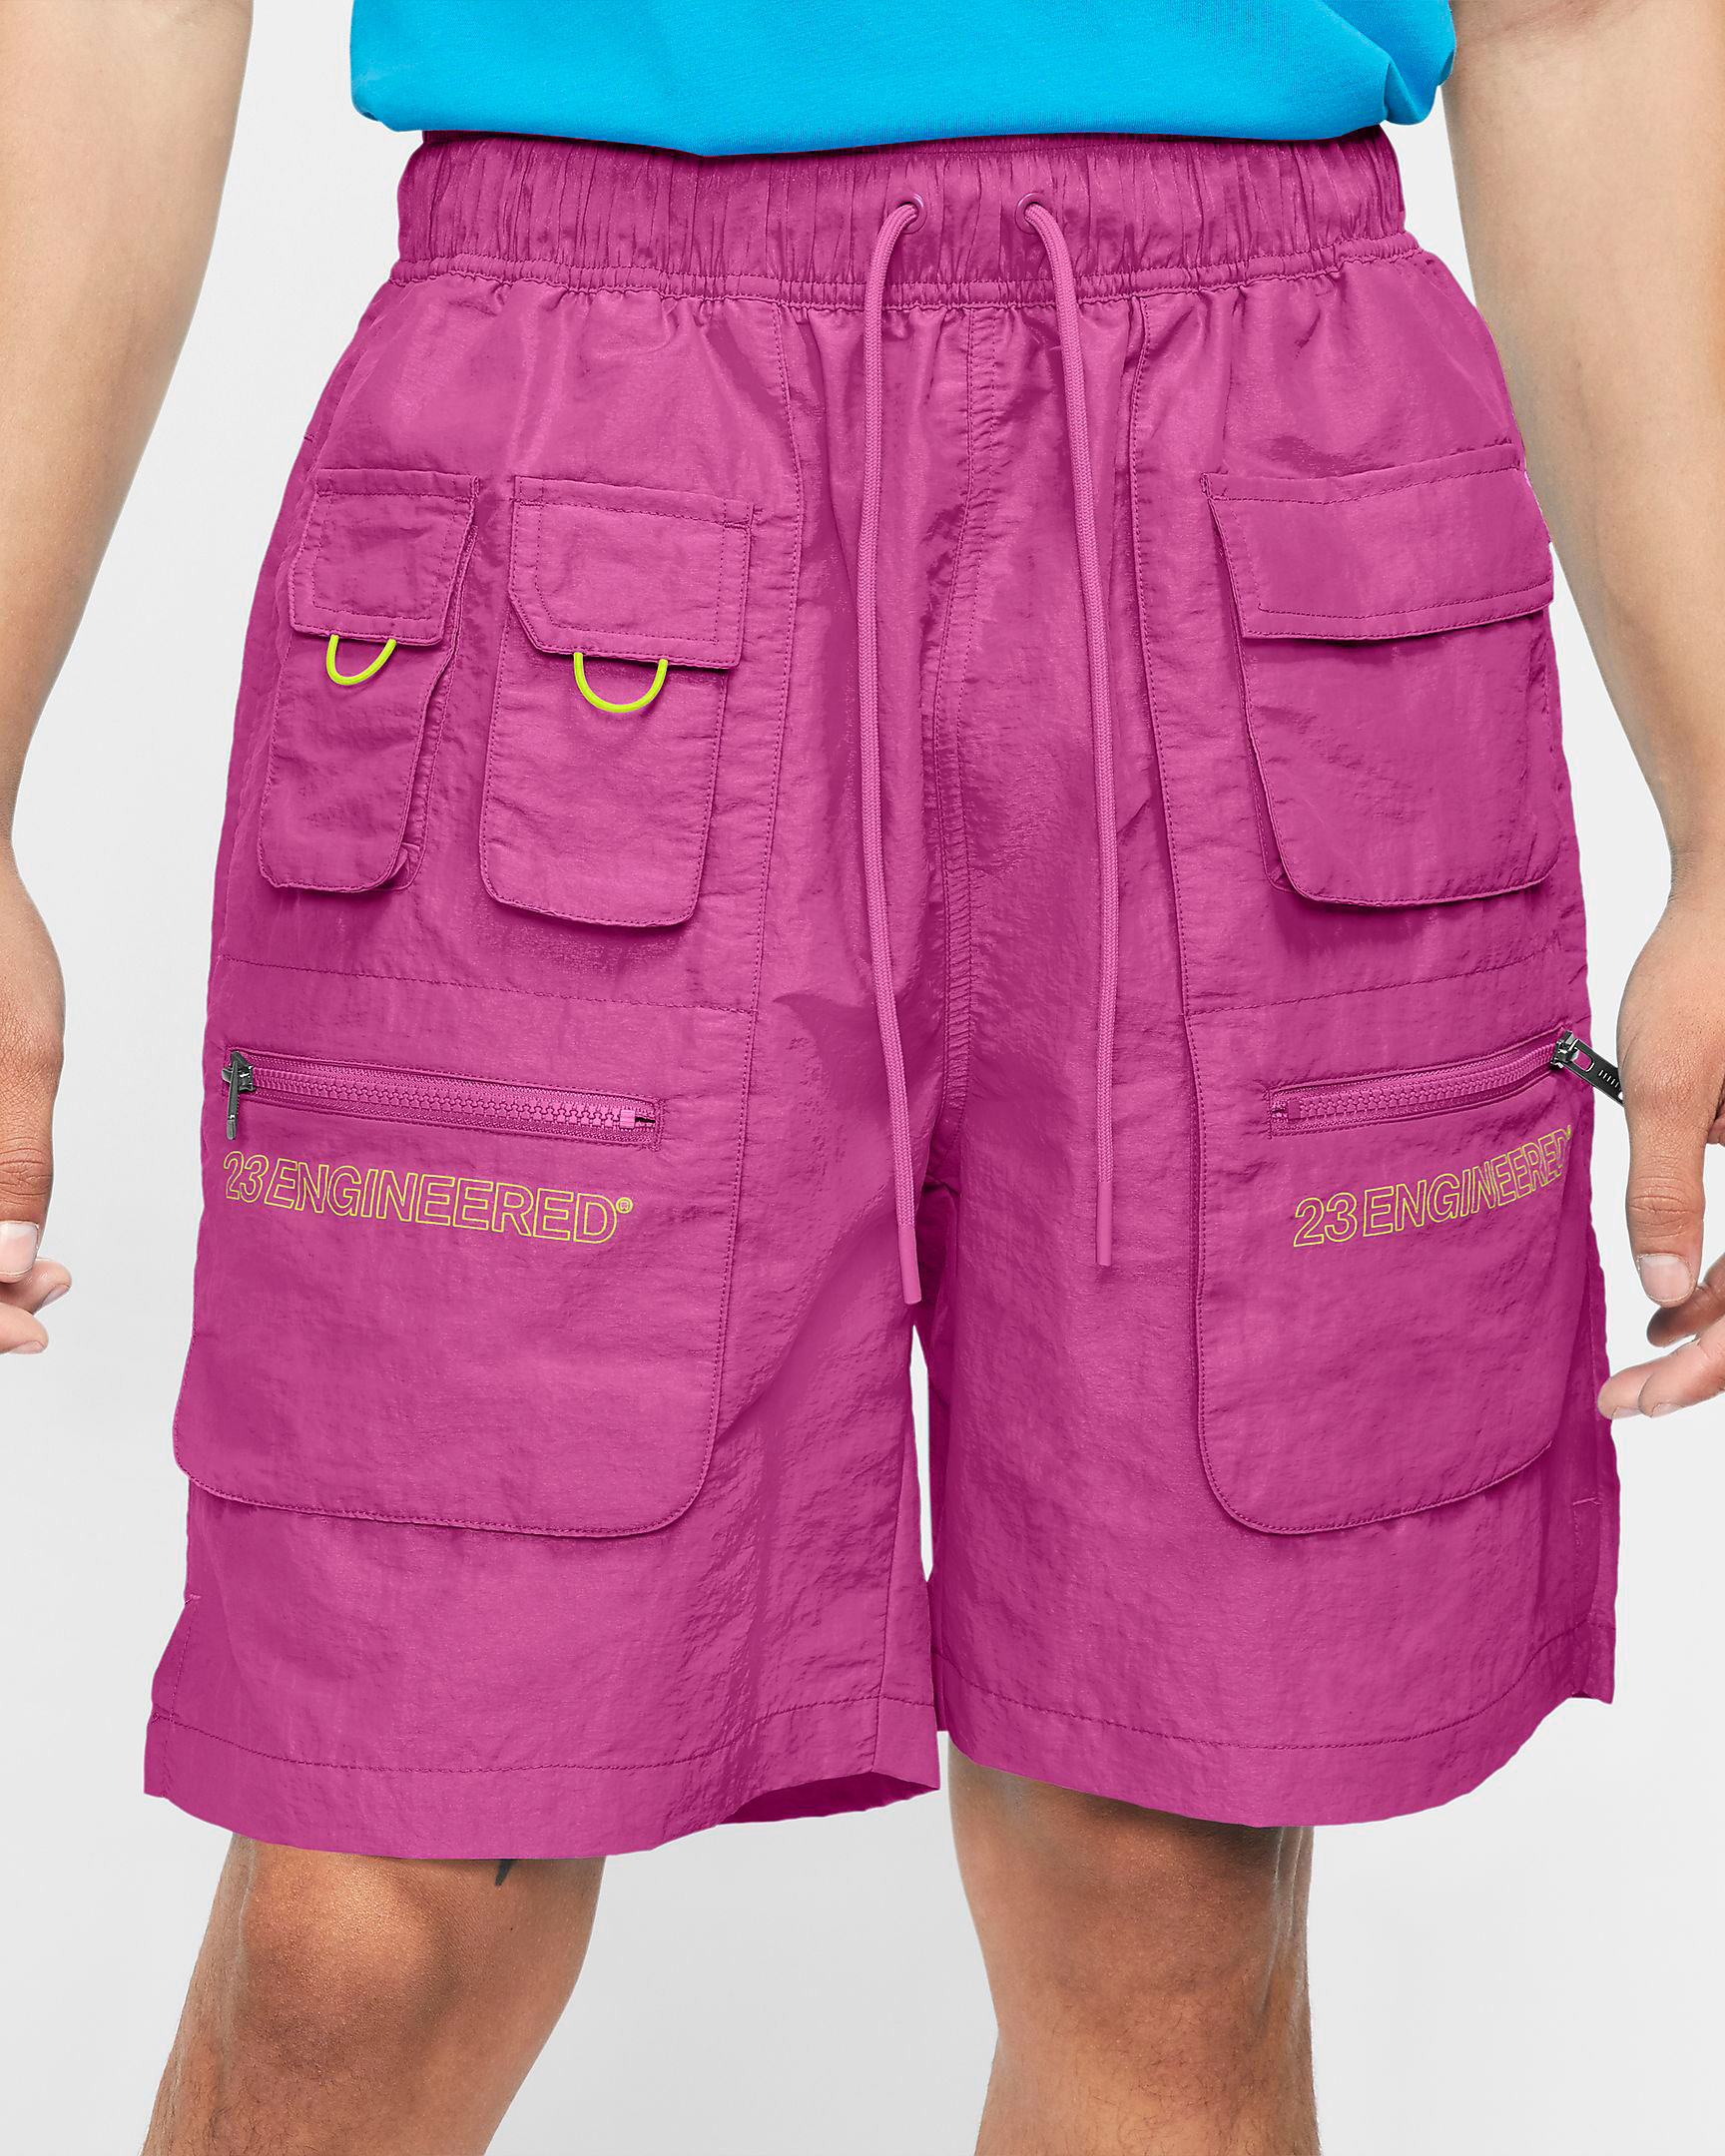 jordan-23-engineered-active-fuchsia-shorts